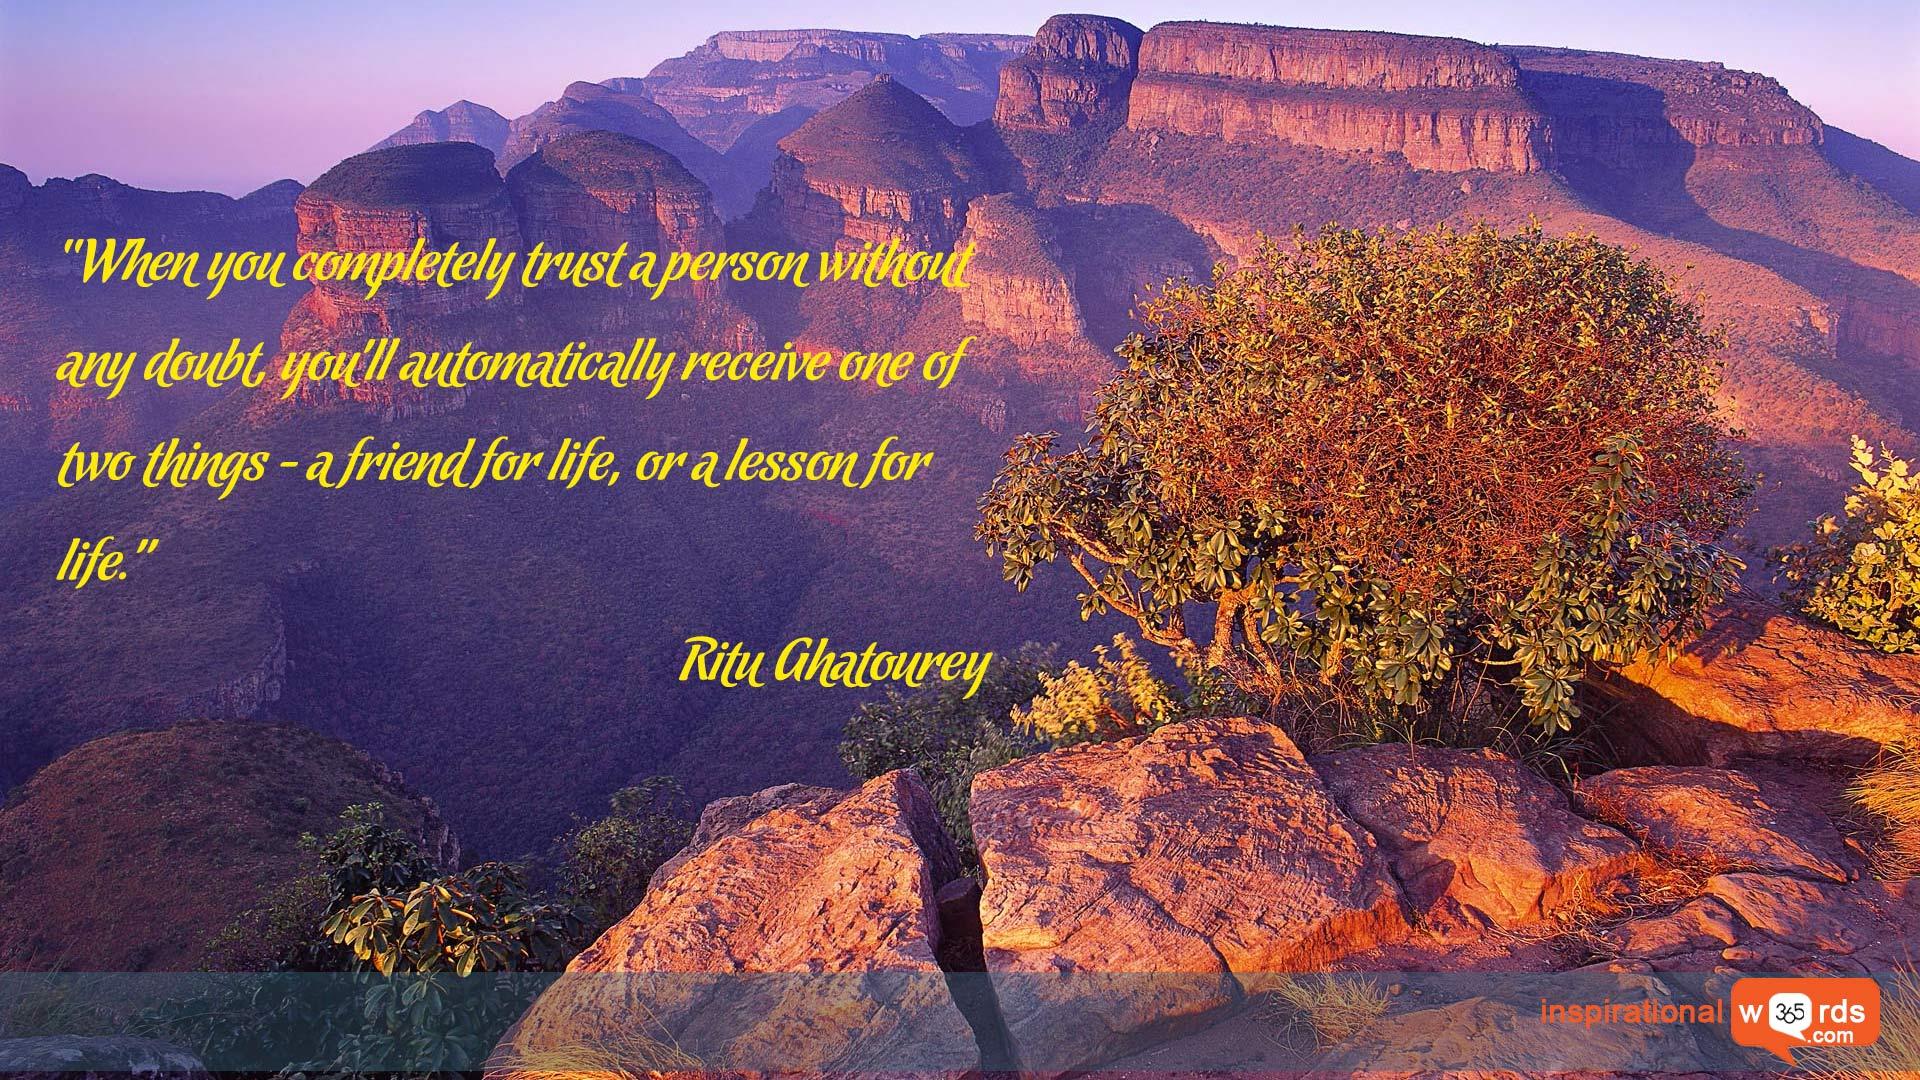 Inspirational Wallpaper Quote by Ritu Ghatourey